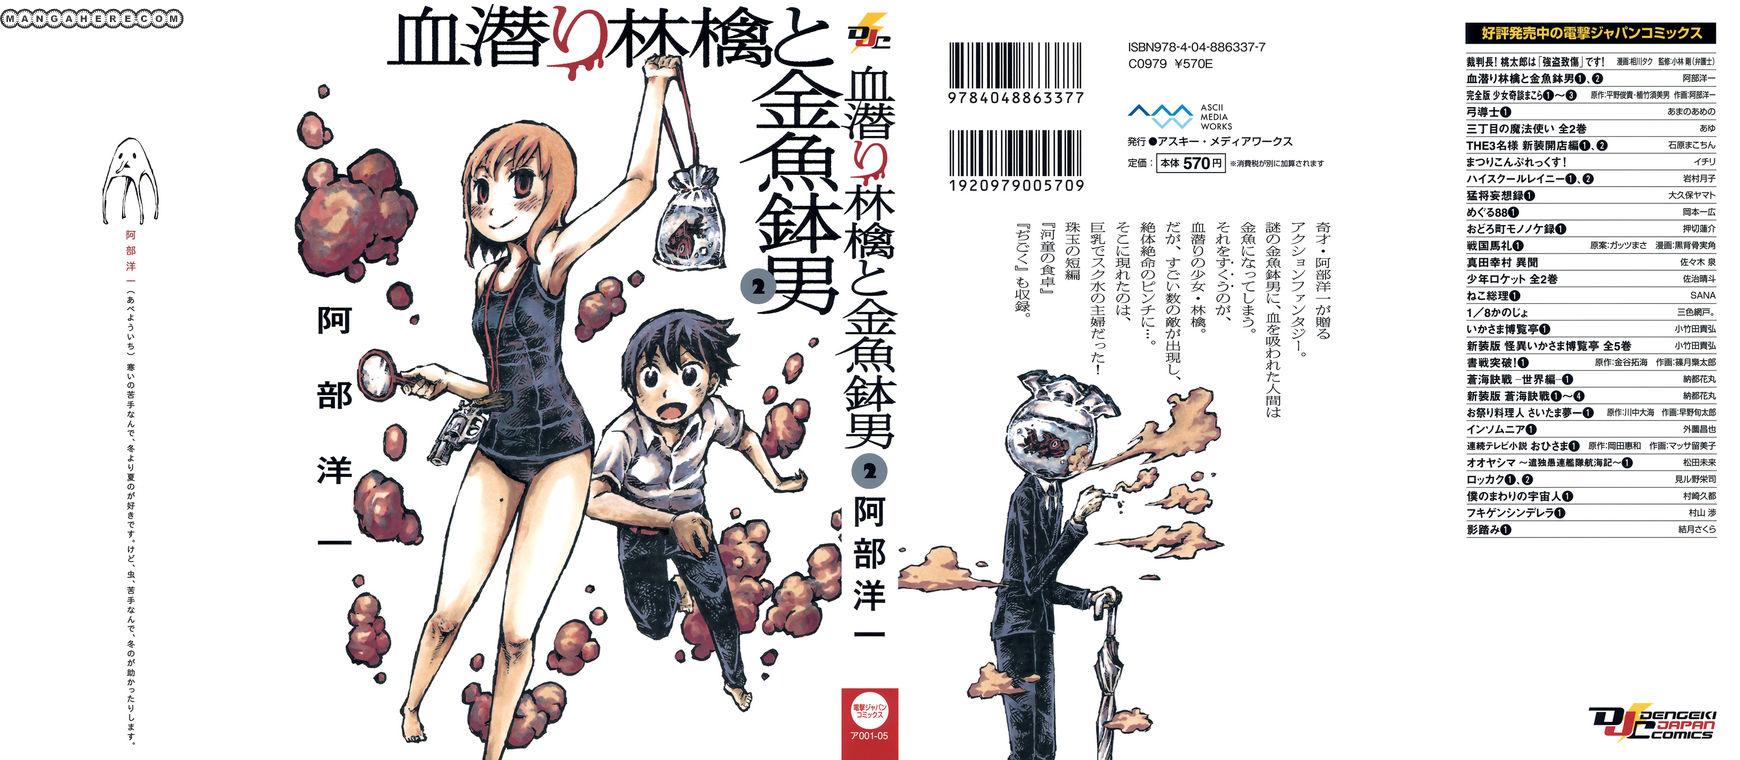 Chimoguri Ringo to Kingyobachi Otoko 8 Page 1